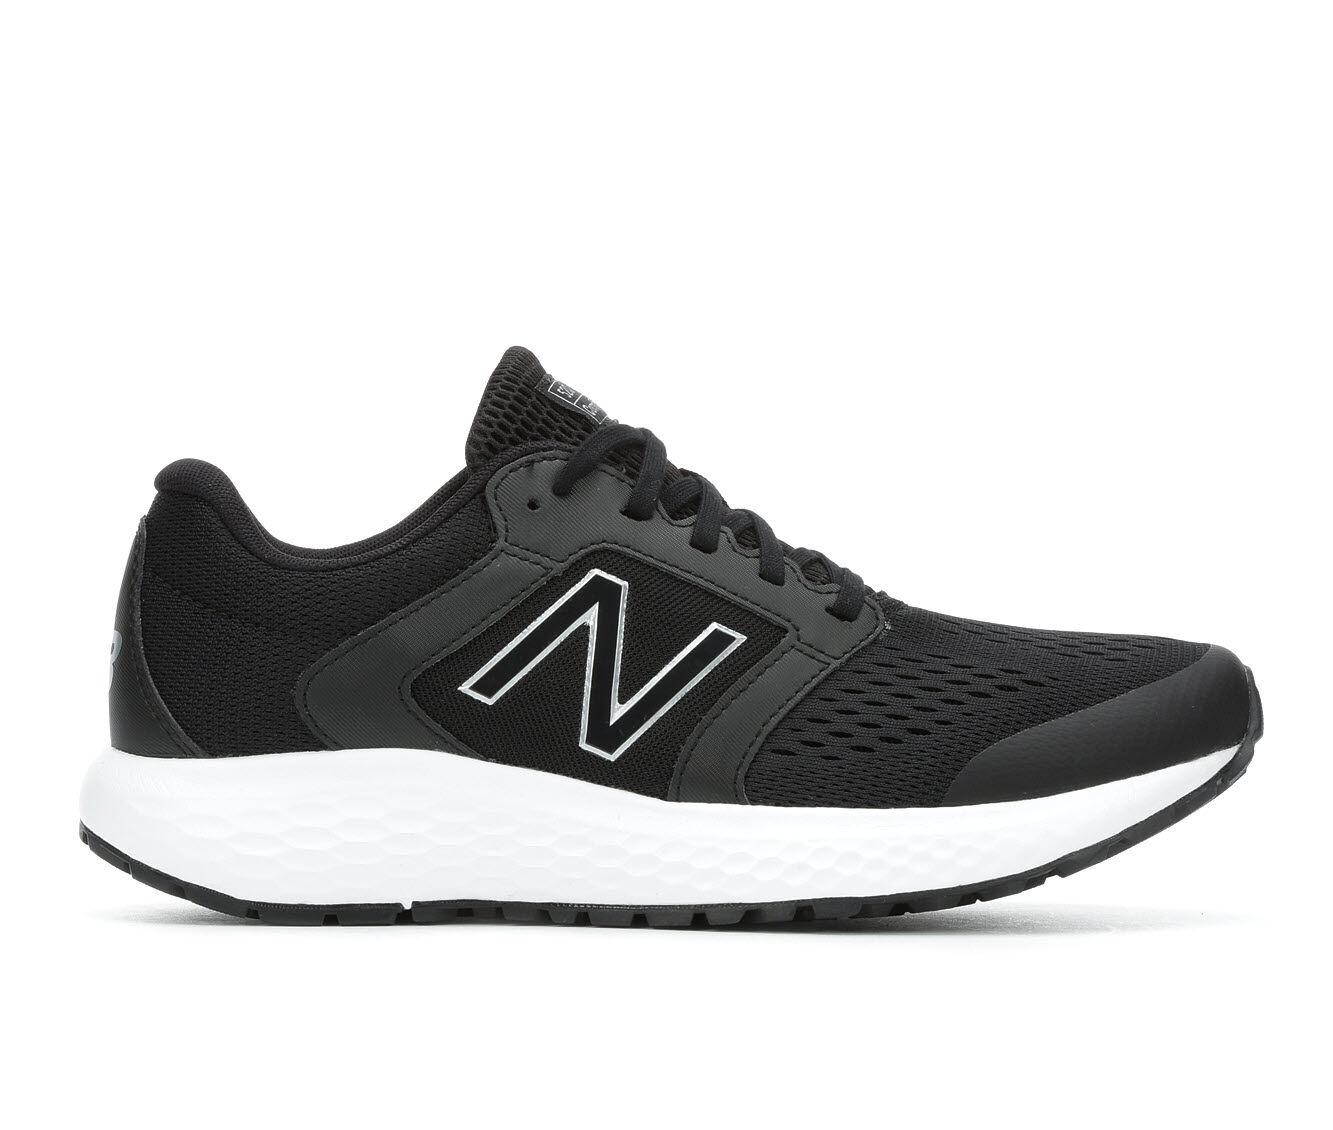 Men's New Balance M520V2 Running Shoes Blk/Wht